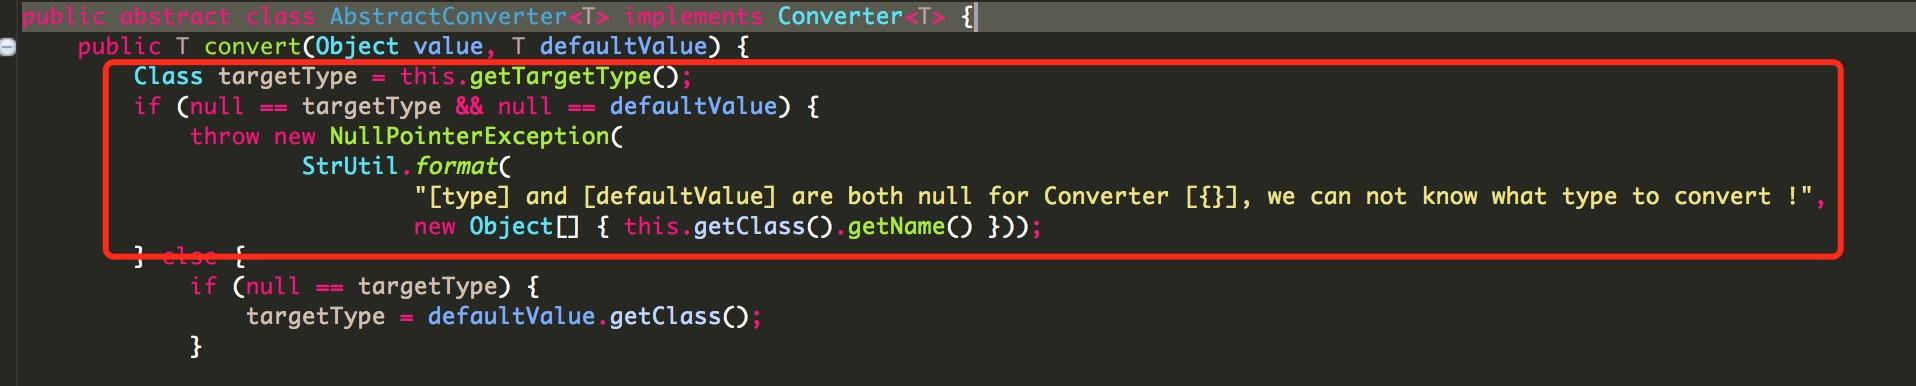 AbstractConverter.convert(Object value, T defaultValue)